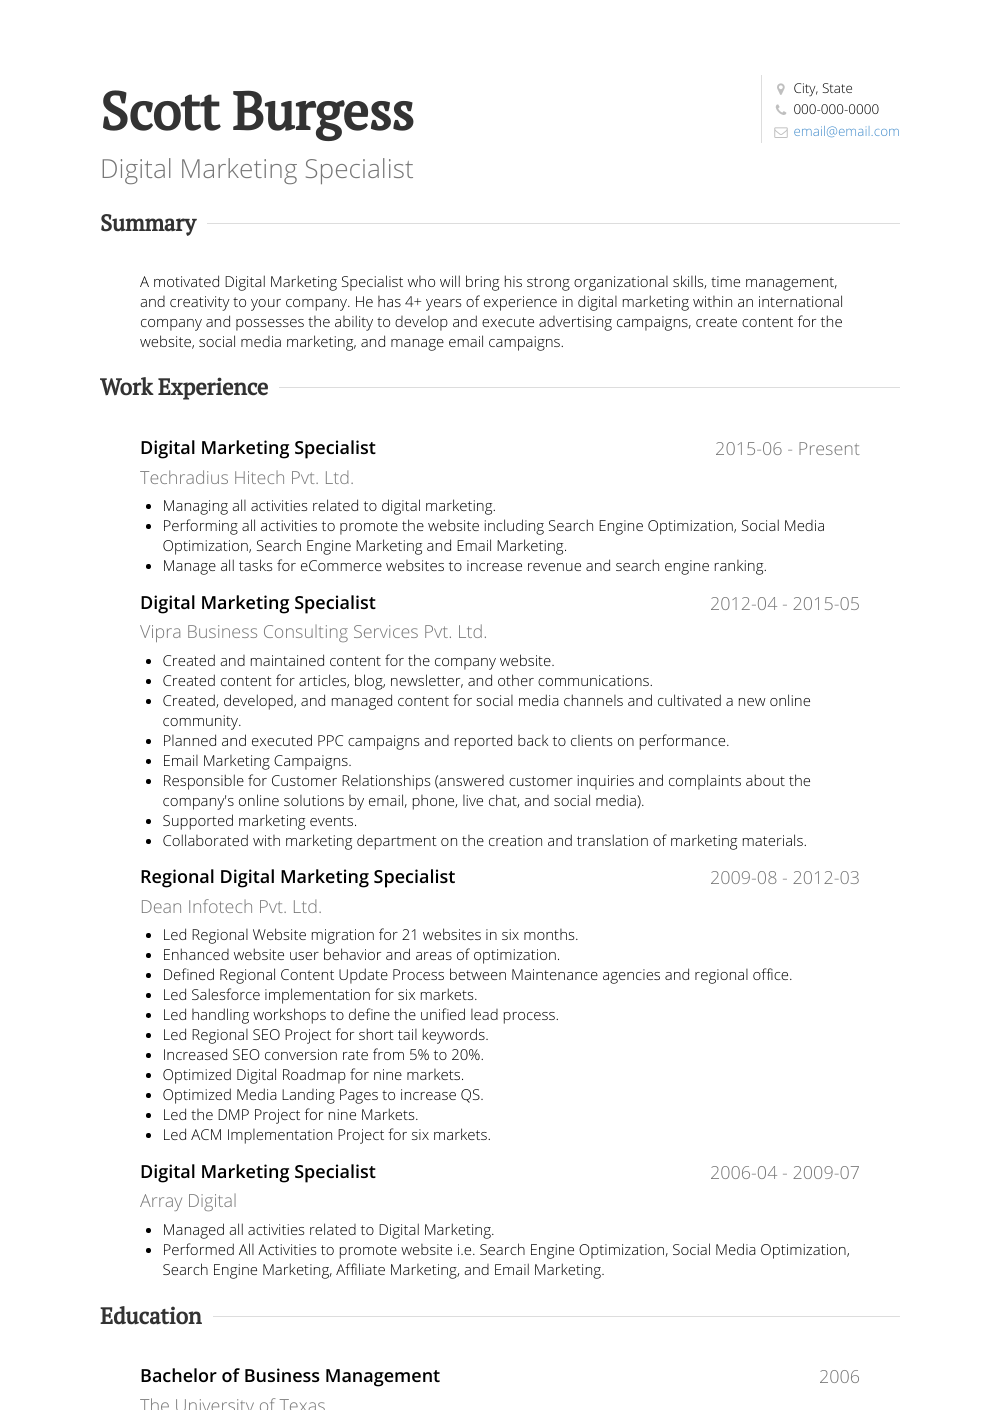 digital marketing cv examples standard - Good digital marketing manager resume sample doc file